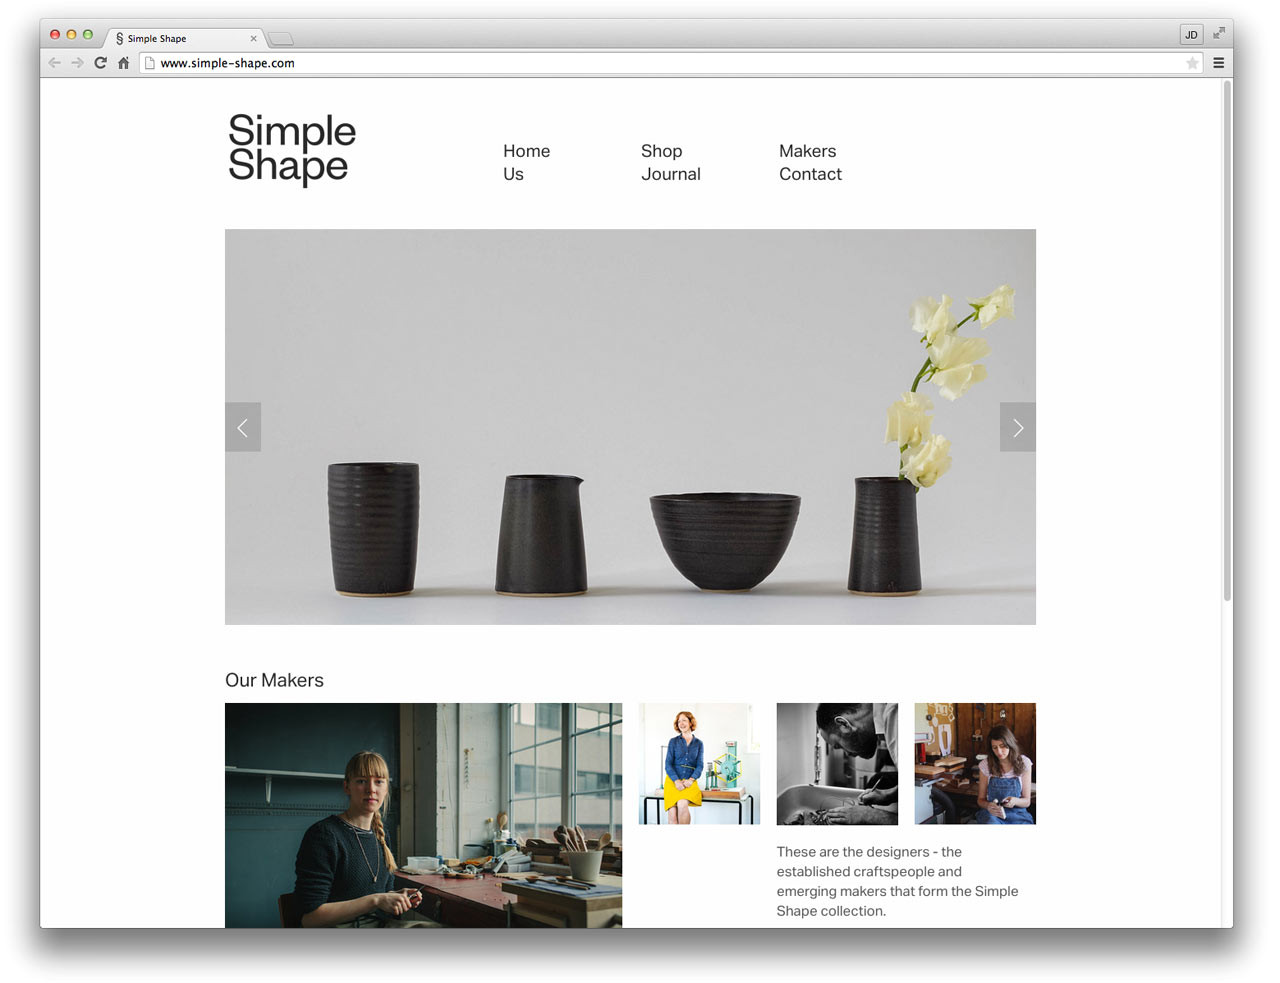 Squarespace.com Templates 10 Well Designed Squarespace Commerce Sites Design Milk